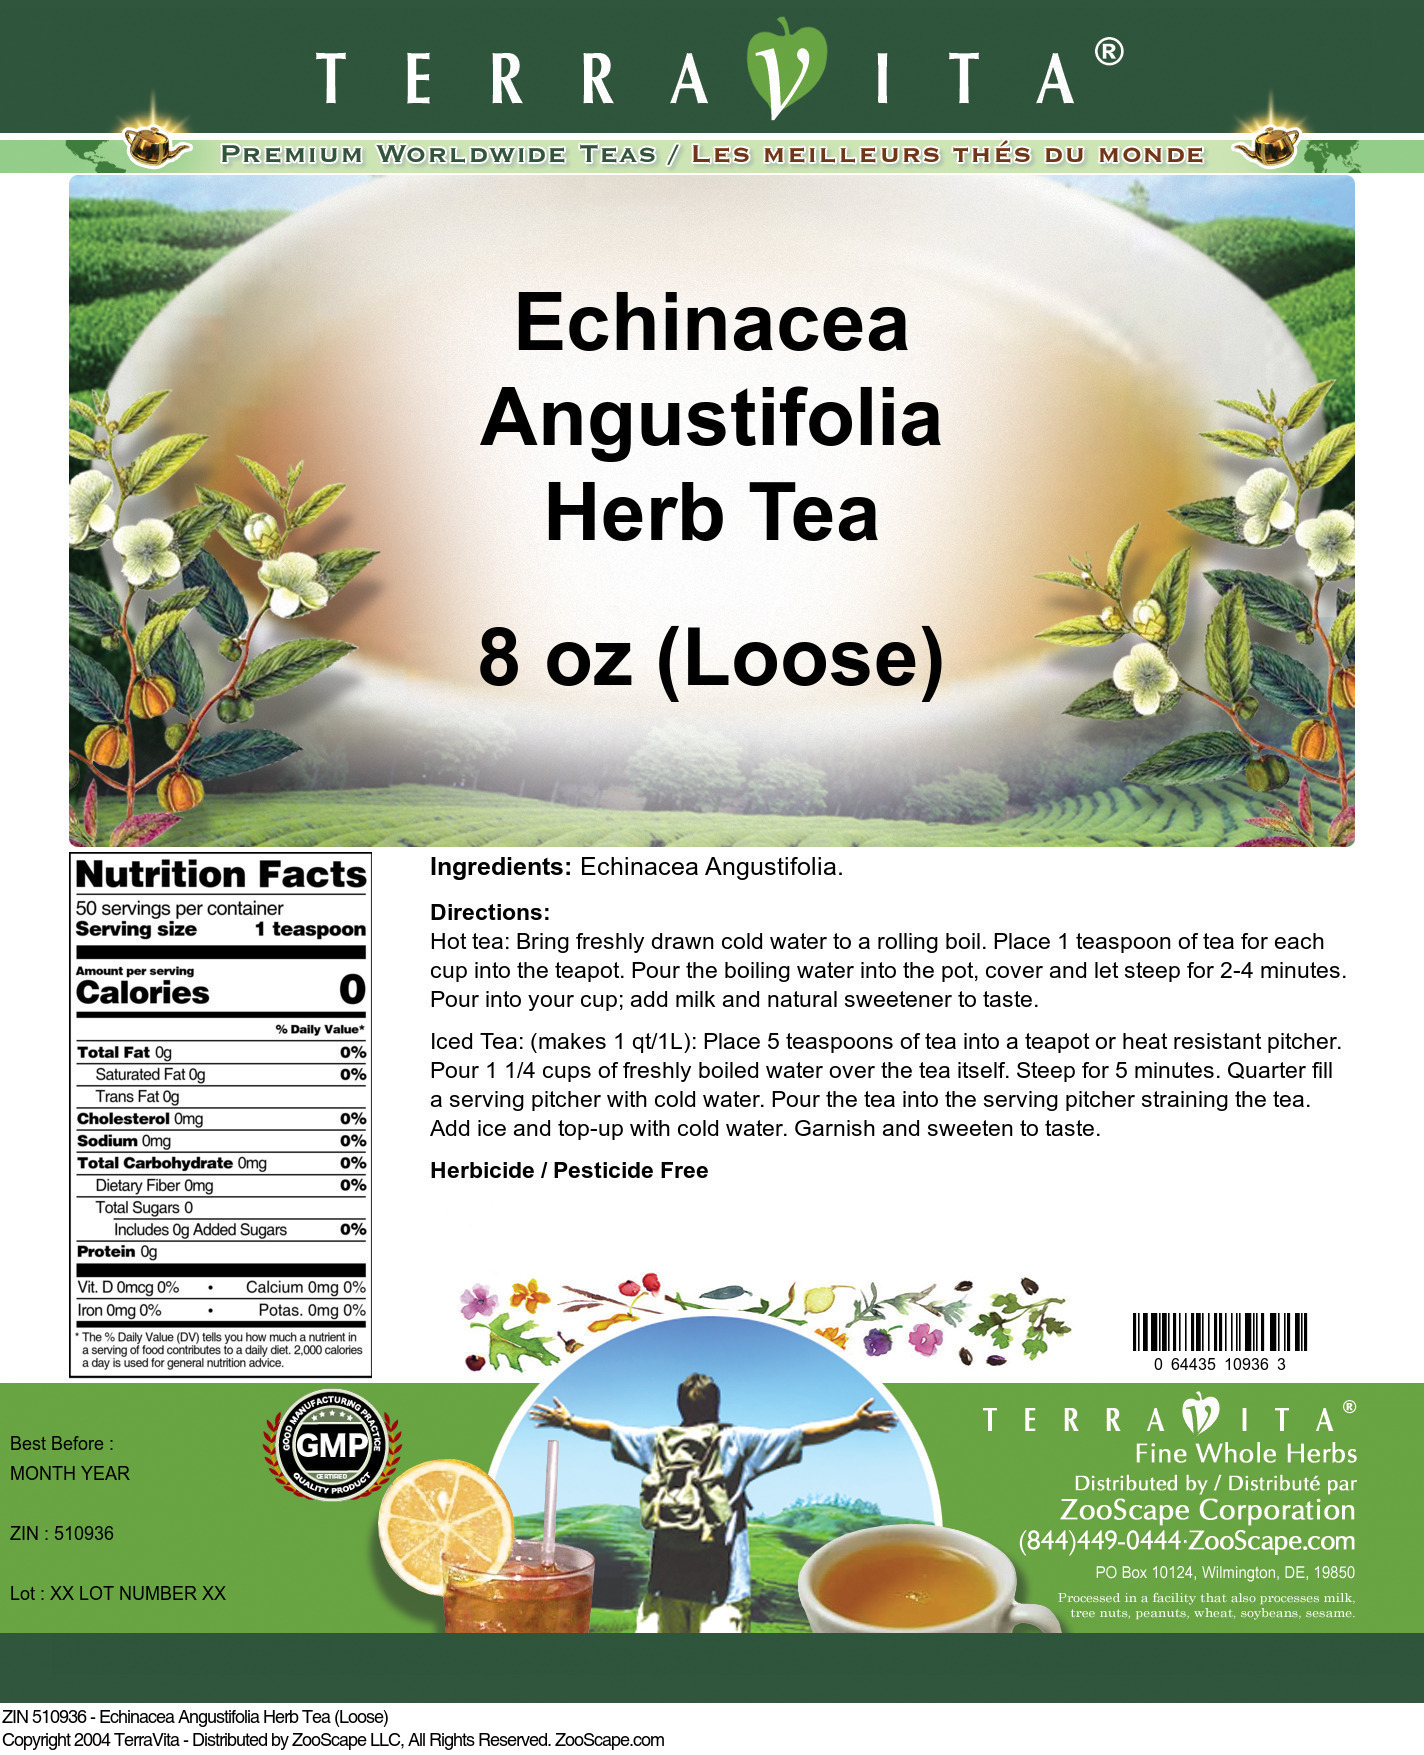 Echinacea Angustifolia Herb Tea (Loose)